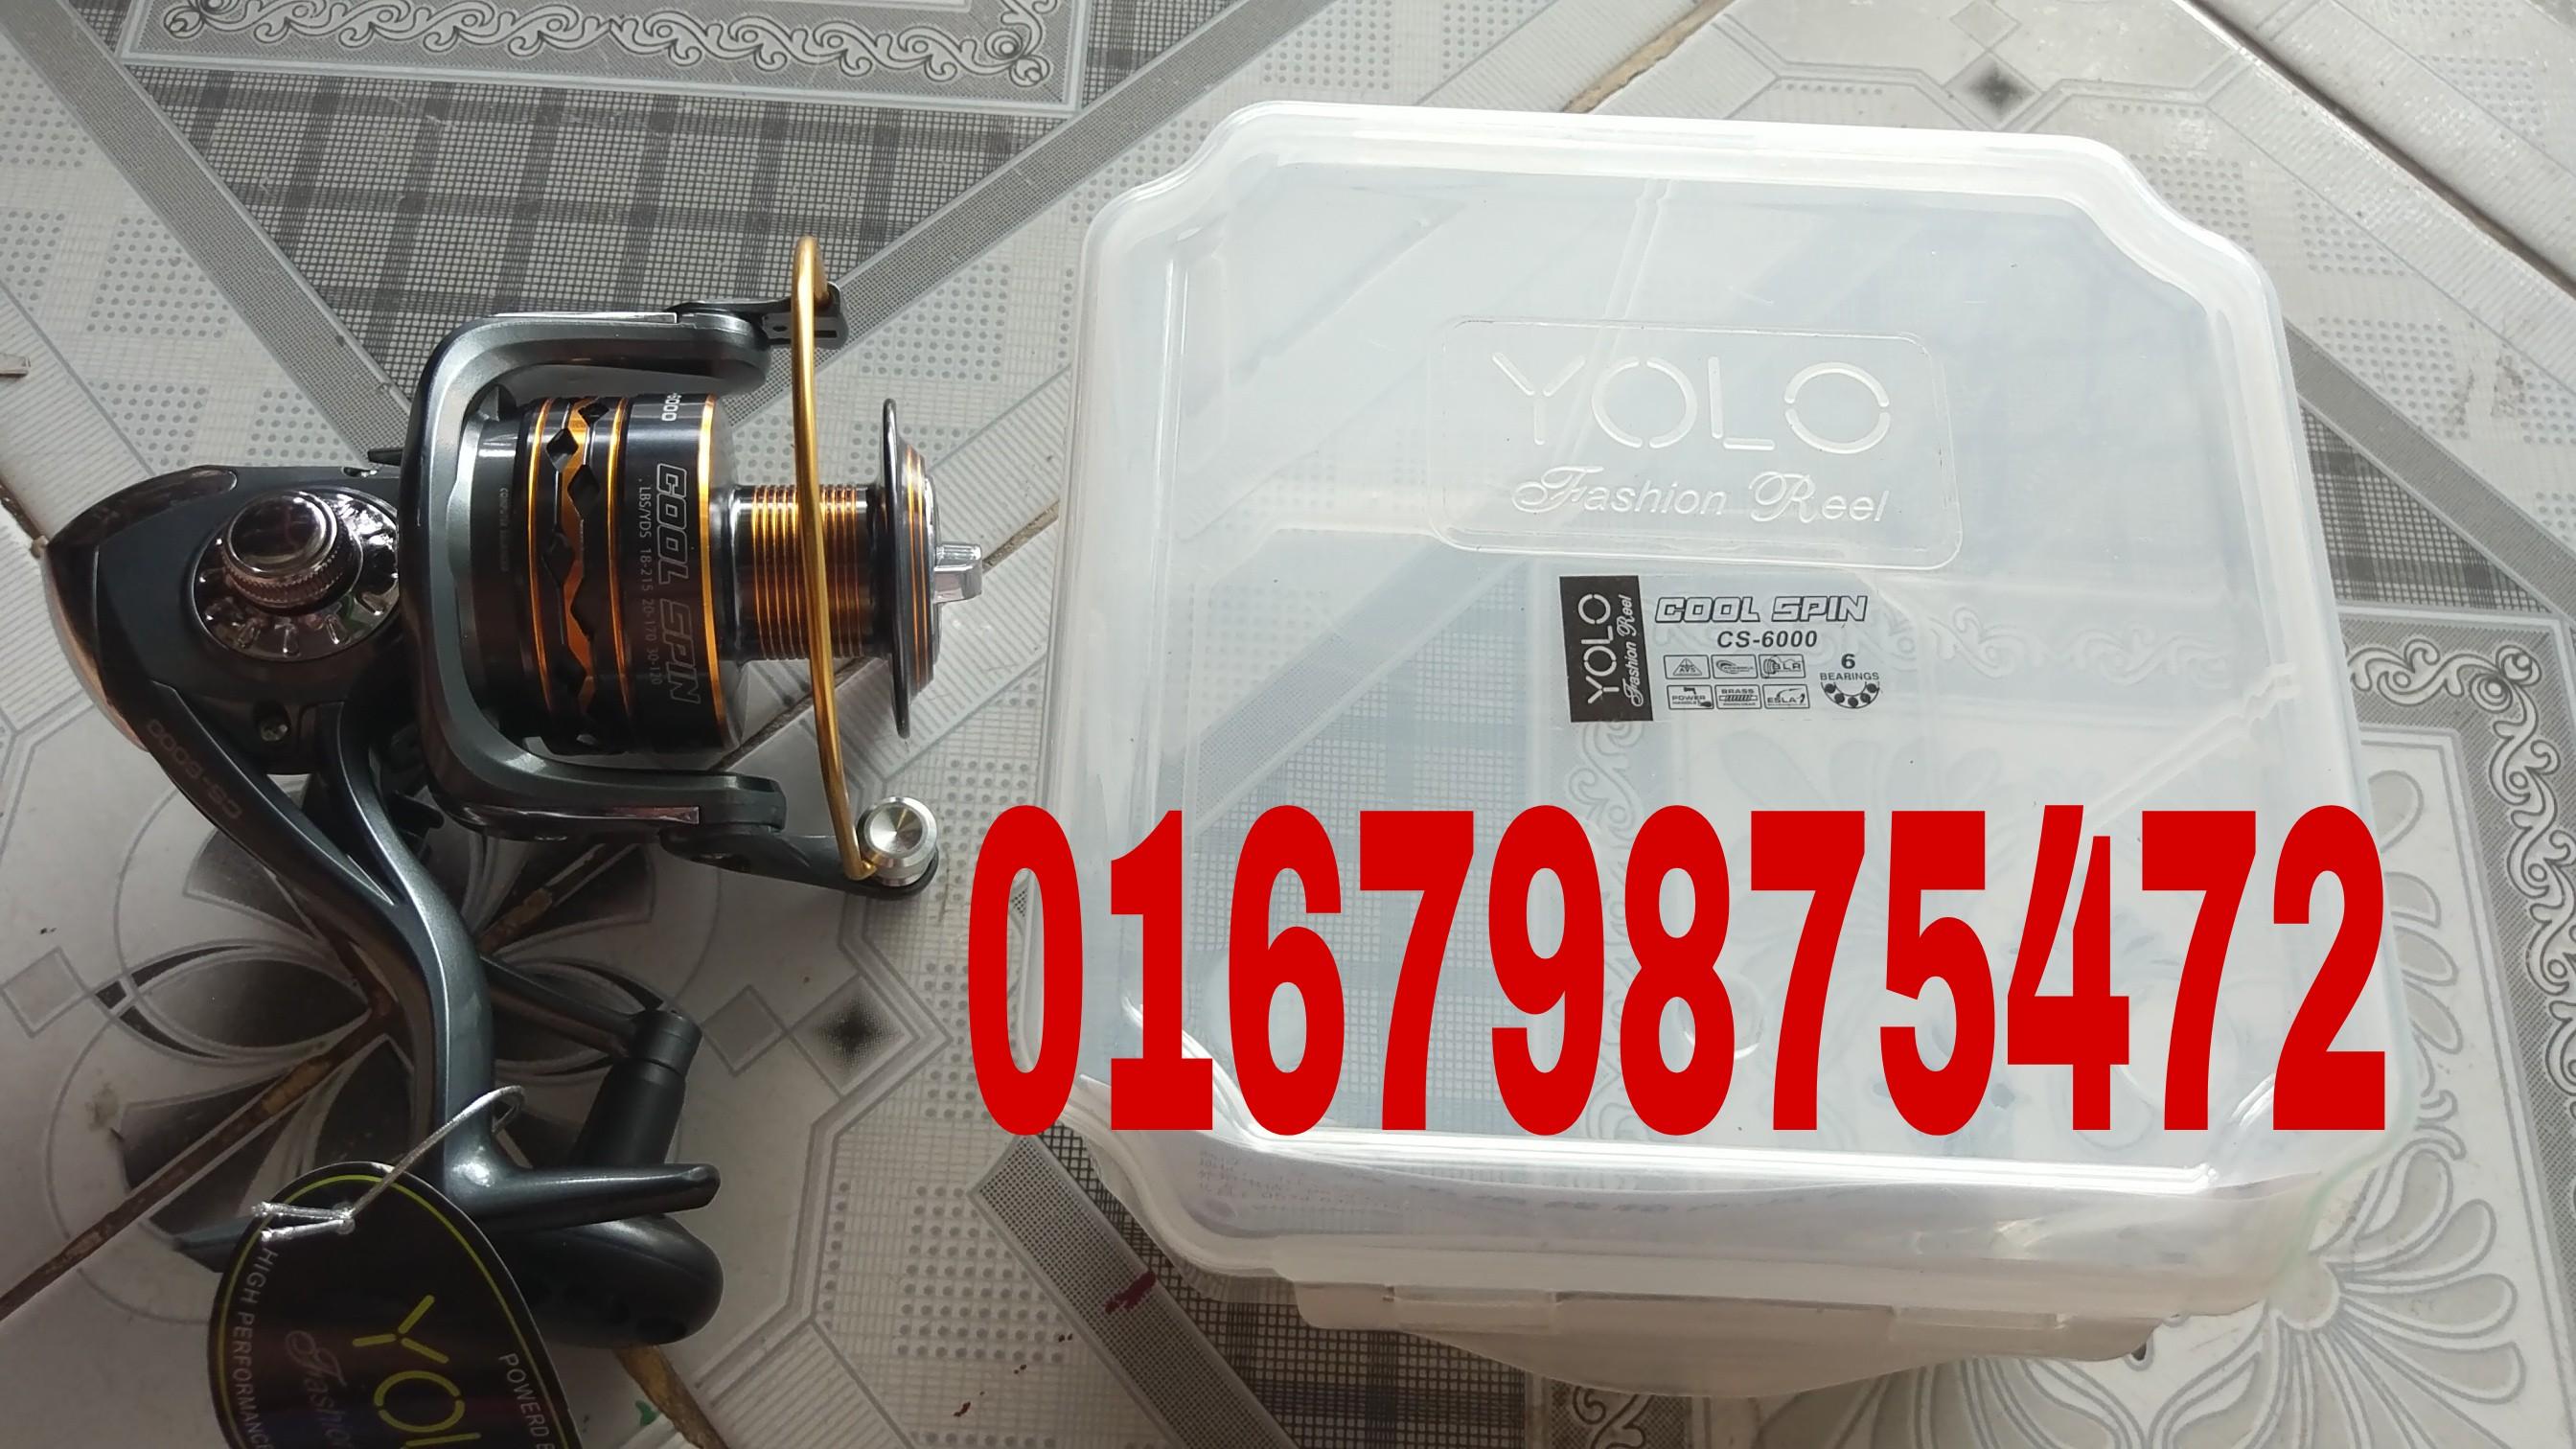 Máy câu Yolo CoolSpin CS6000